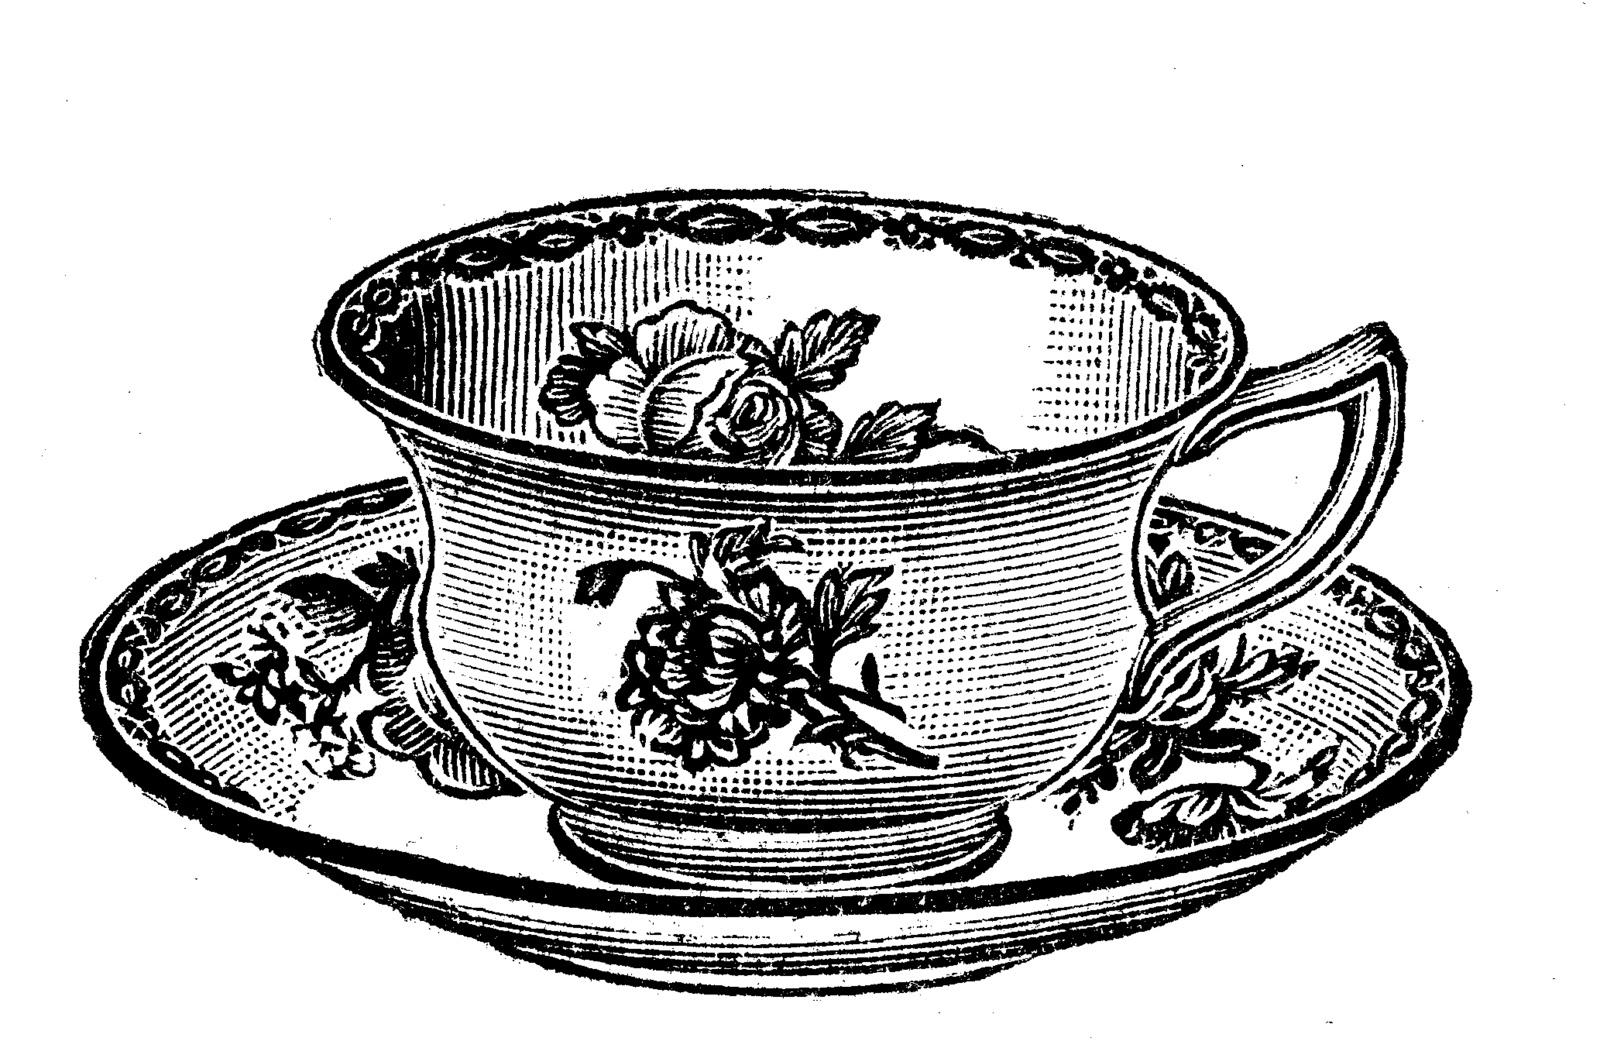 Vintage Teapot Vintage Teapot Vintage Te-Vintage Teapot Vintage Teapot Vintage Teapot Vintage Cup And Saucer-16